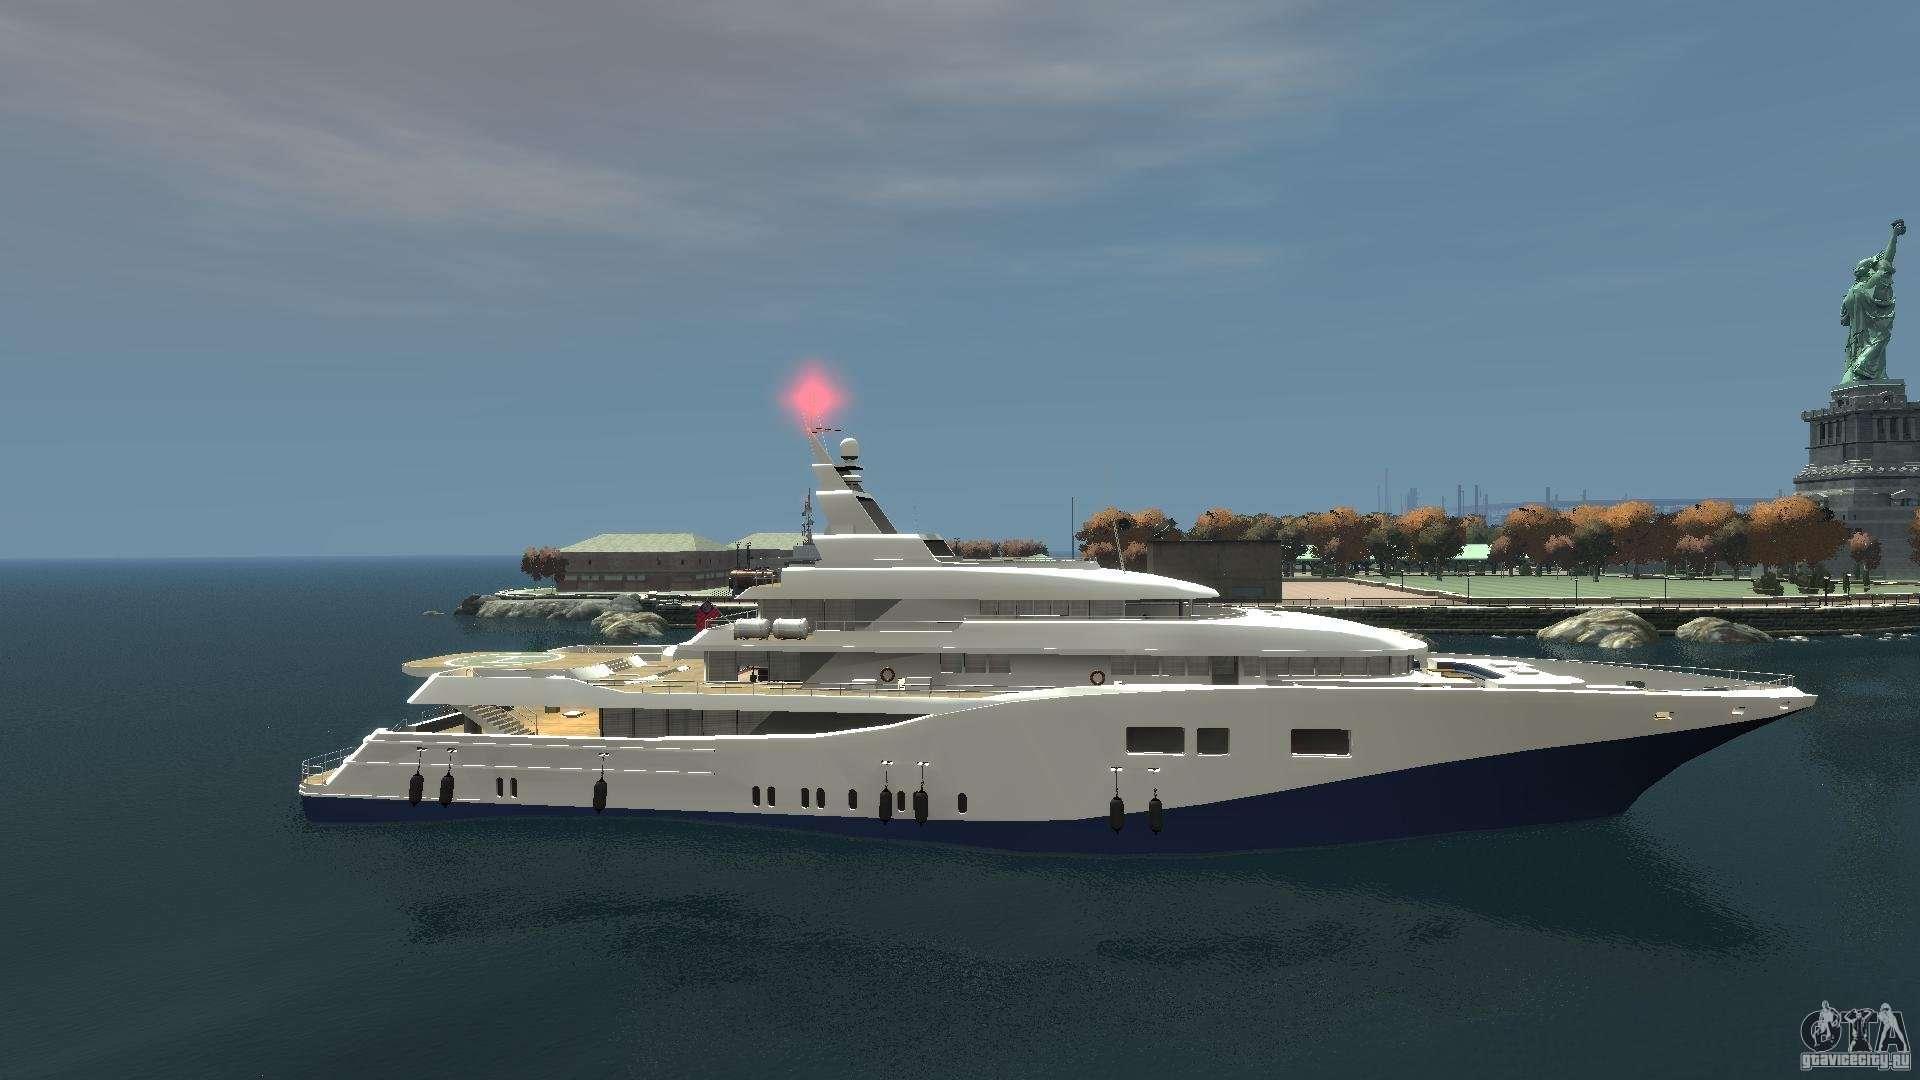 Gta 5 мод на Яхту